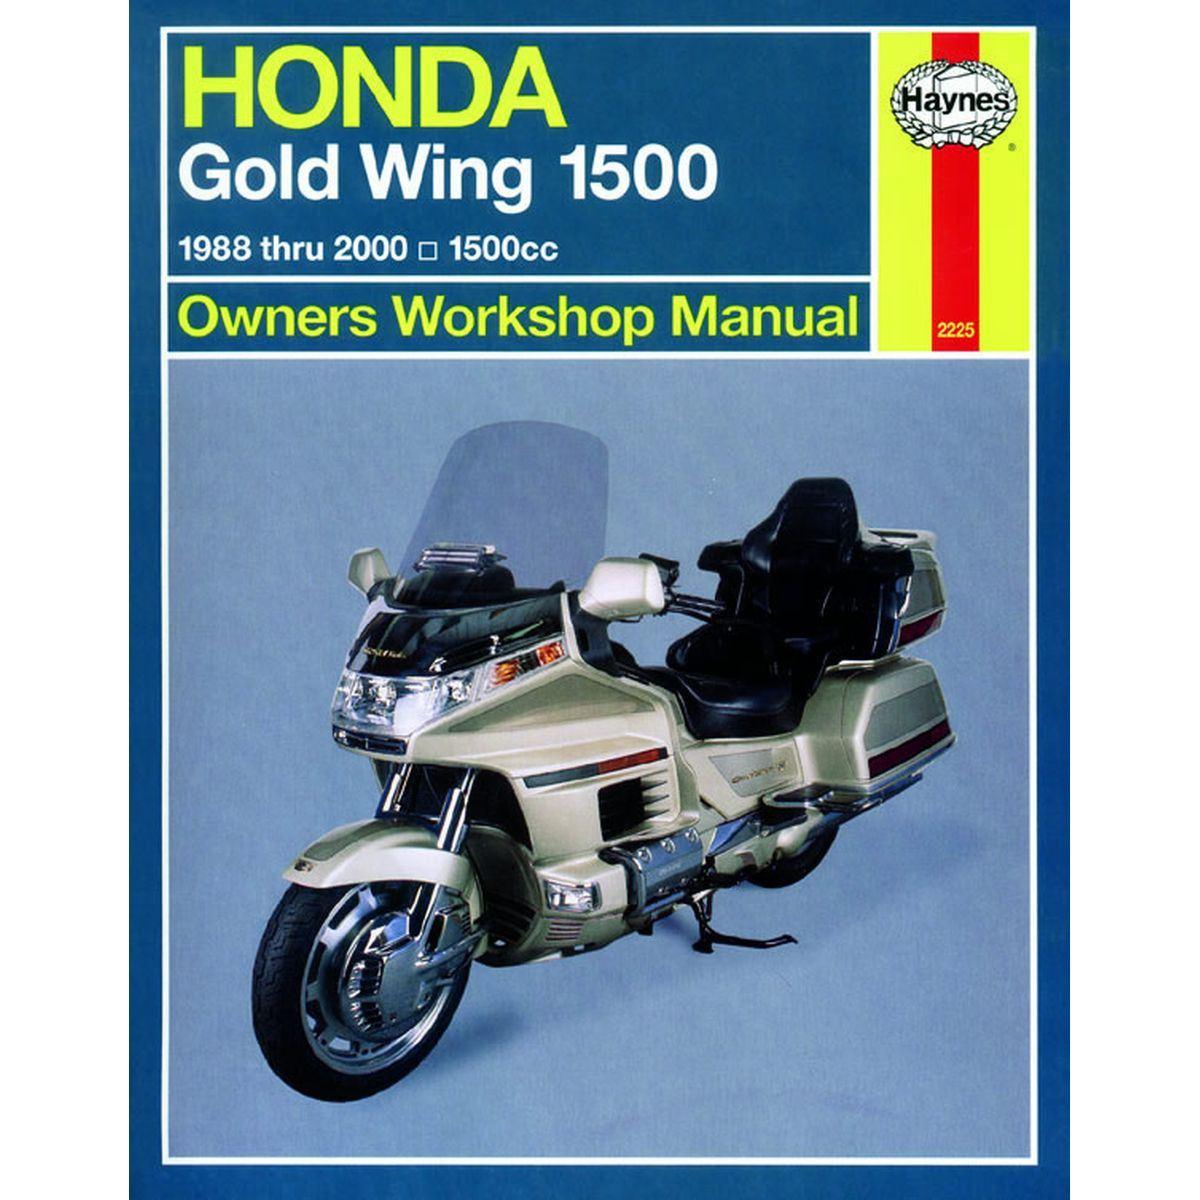 manual haynes for 1996 honda gl 1500 at gold wing aspencade ebay rh ebay co uk GL1200 Aspencade 1985 Honda Goldwing Aspencade